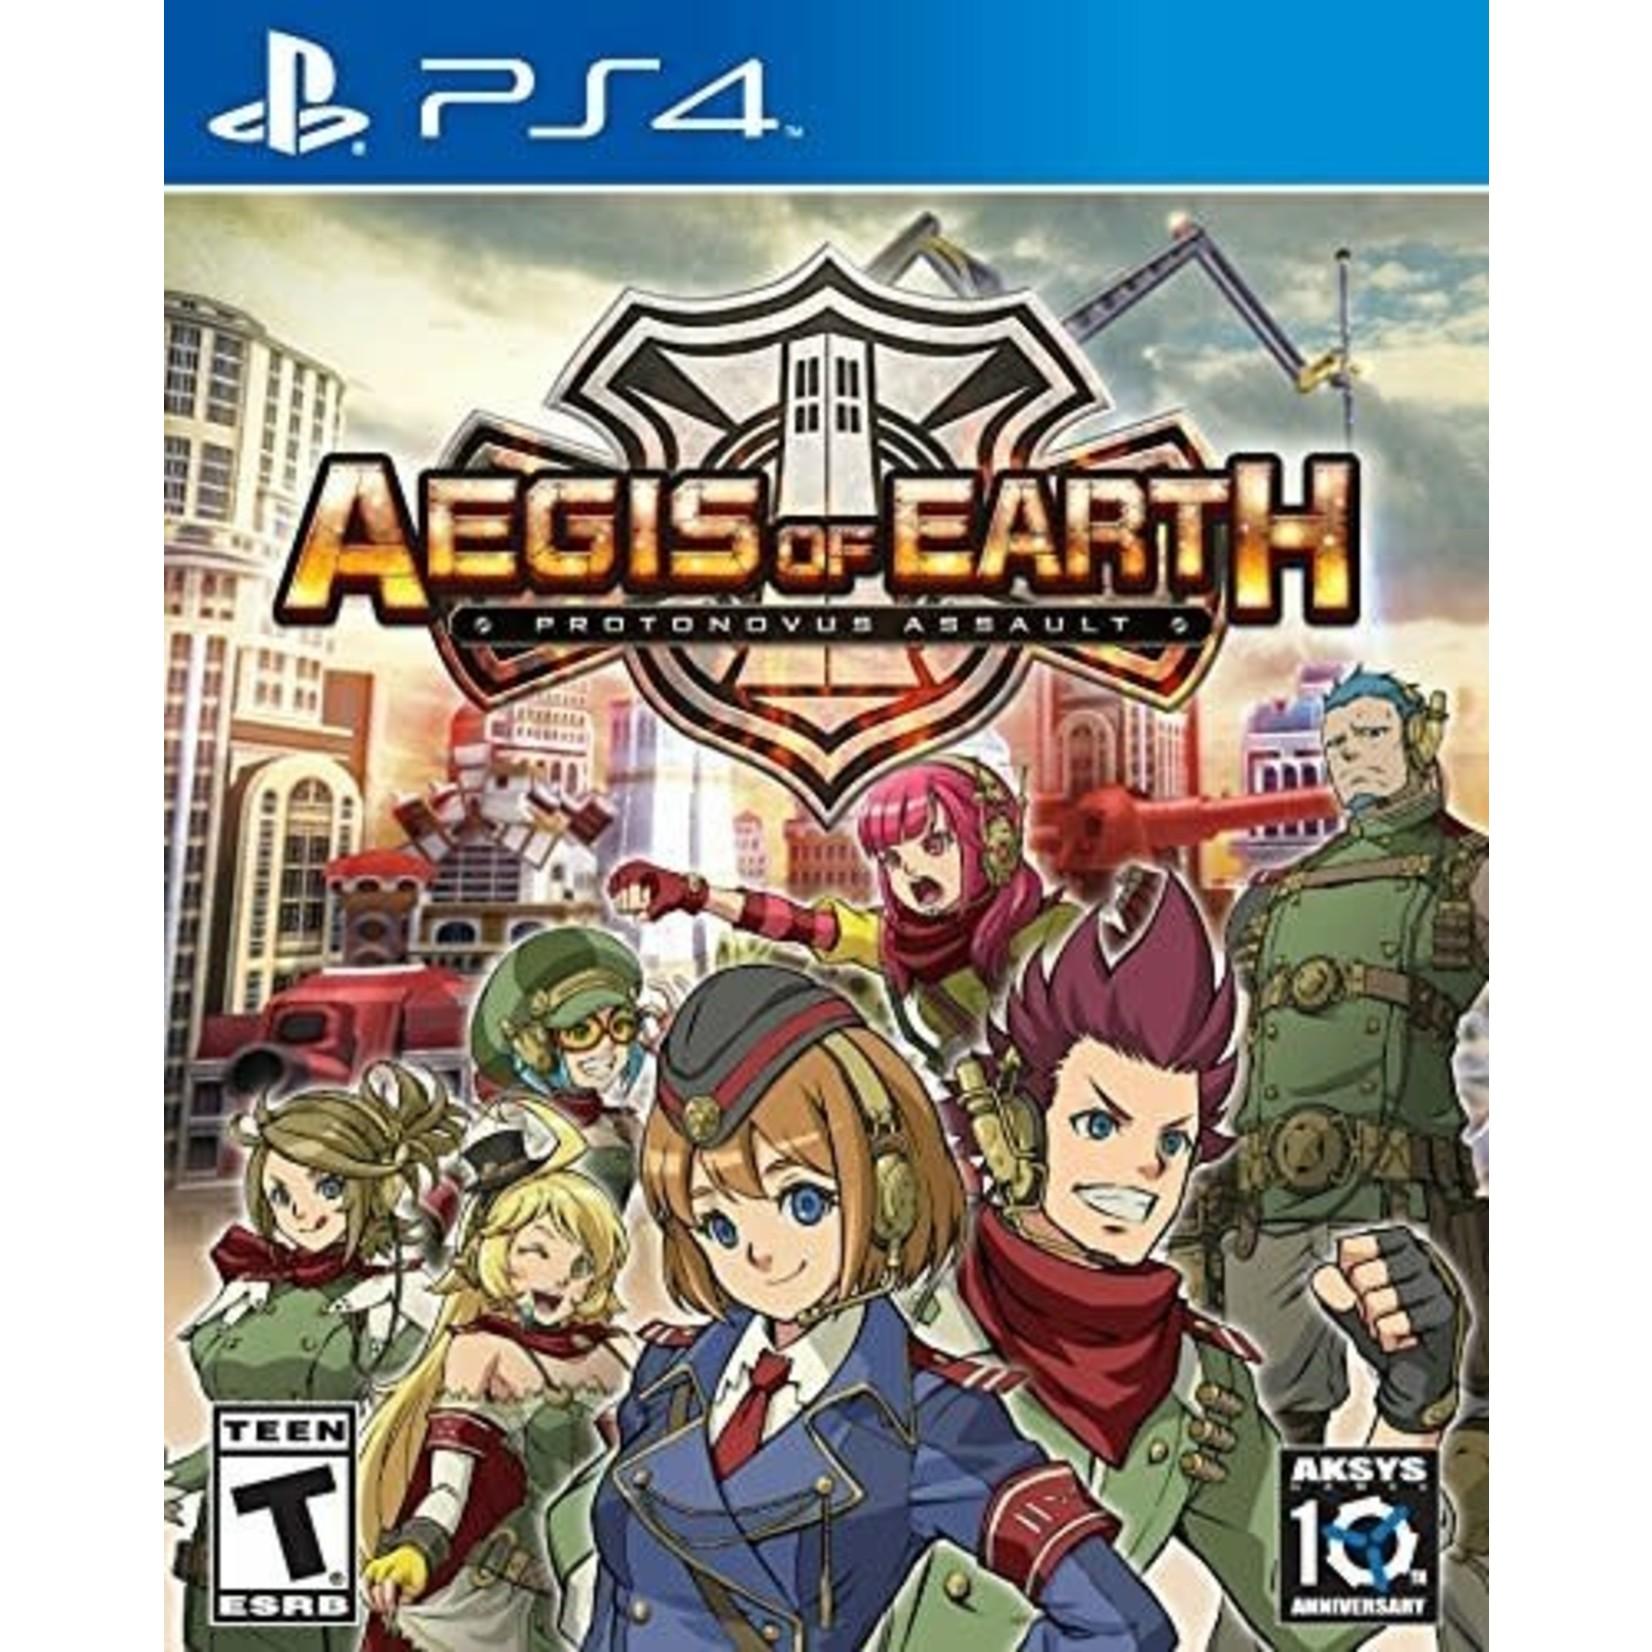 PS4-Aegis of Earth: Protonovus Assault